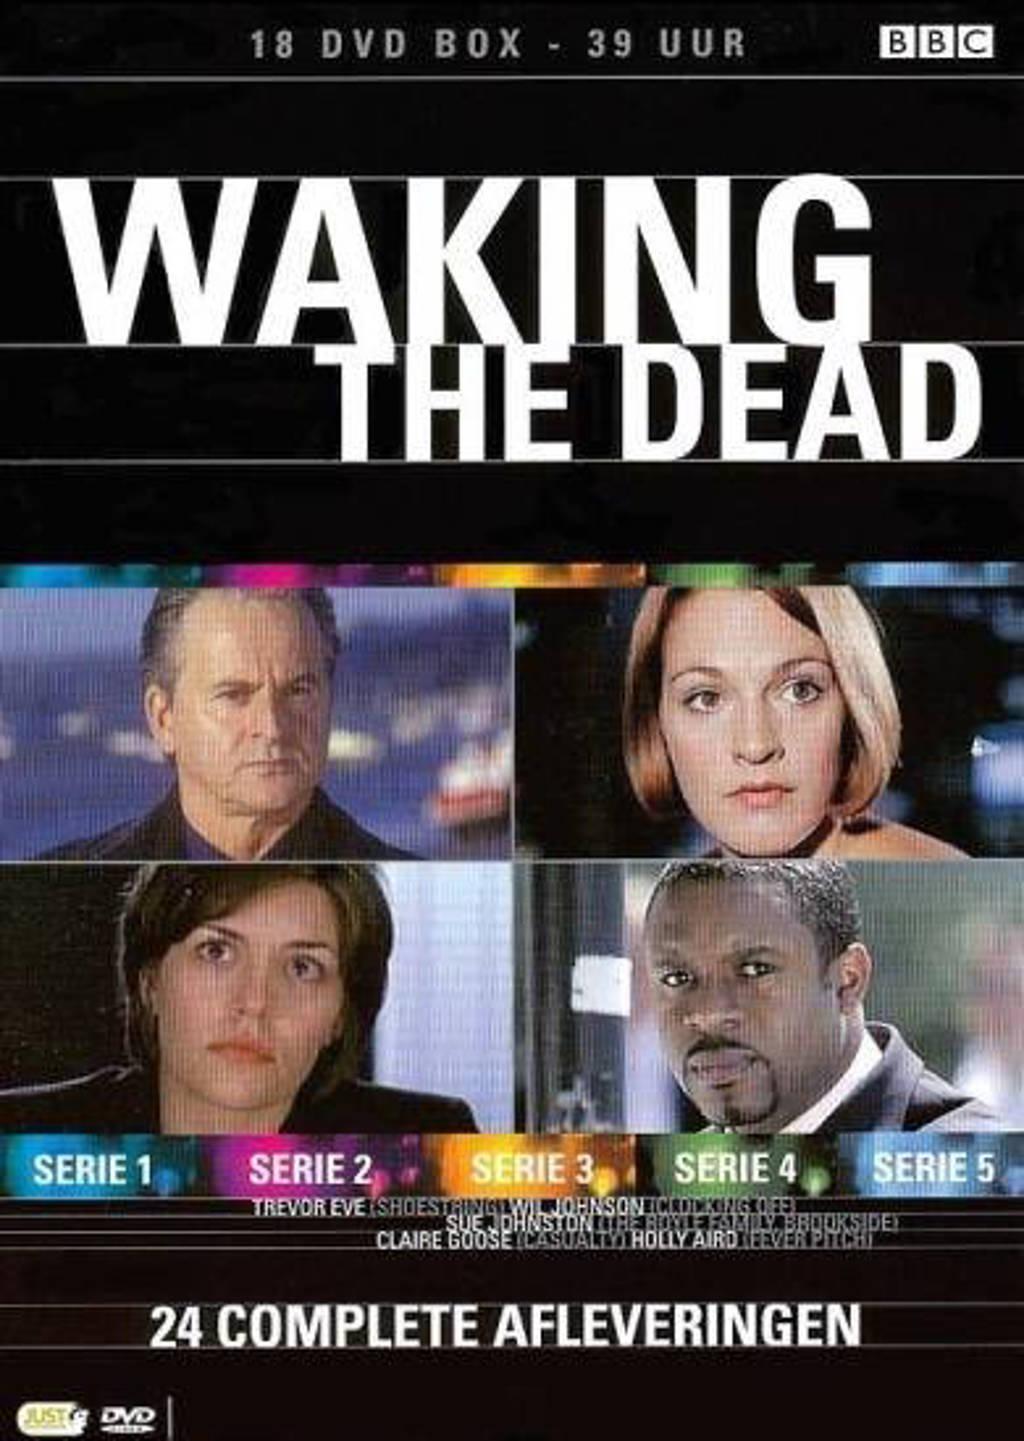 Waking the dead - Seizoen 1-5 (DVD)